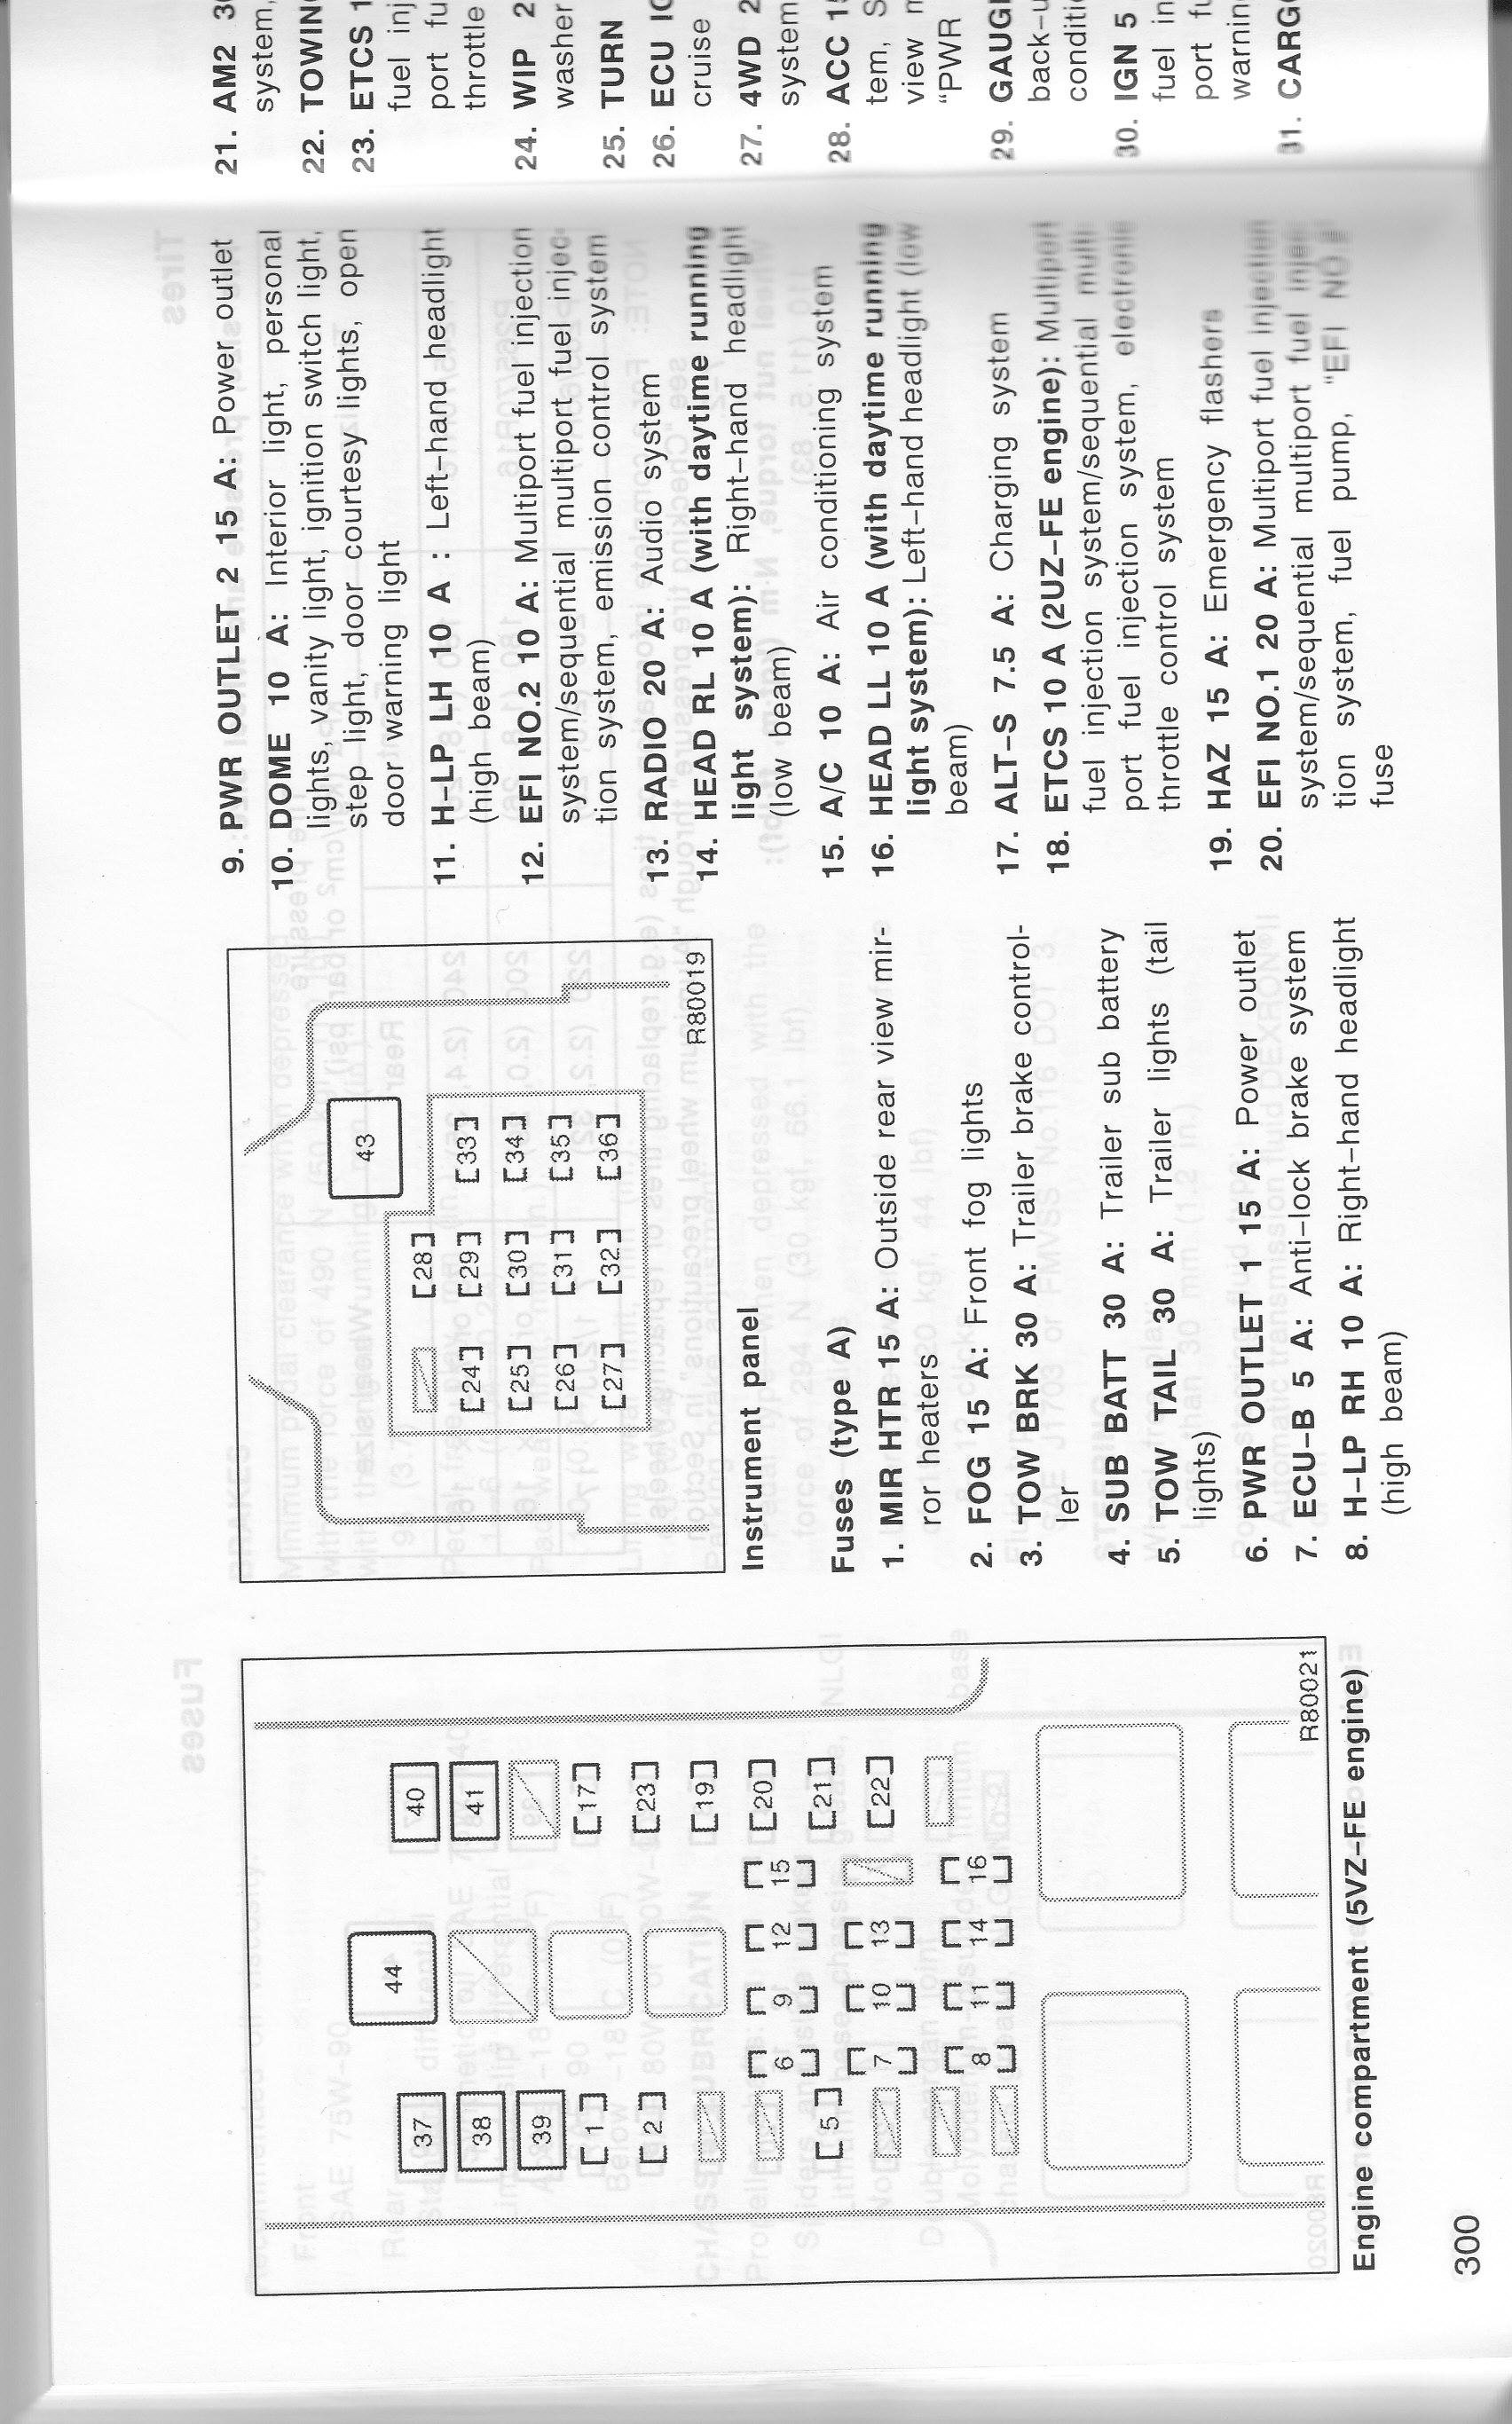 2013 tundra fuse box id